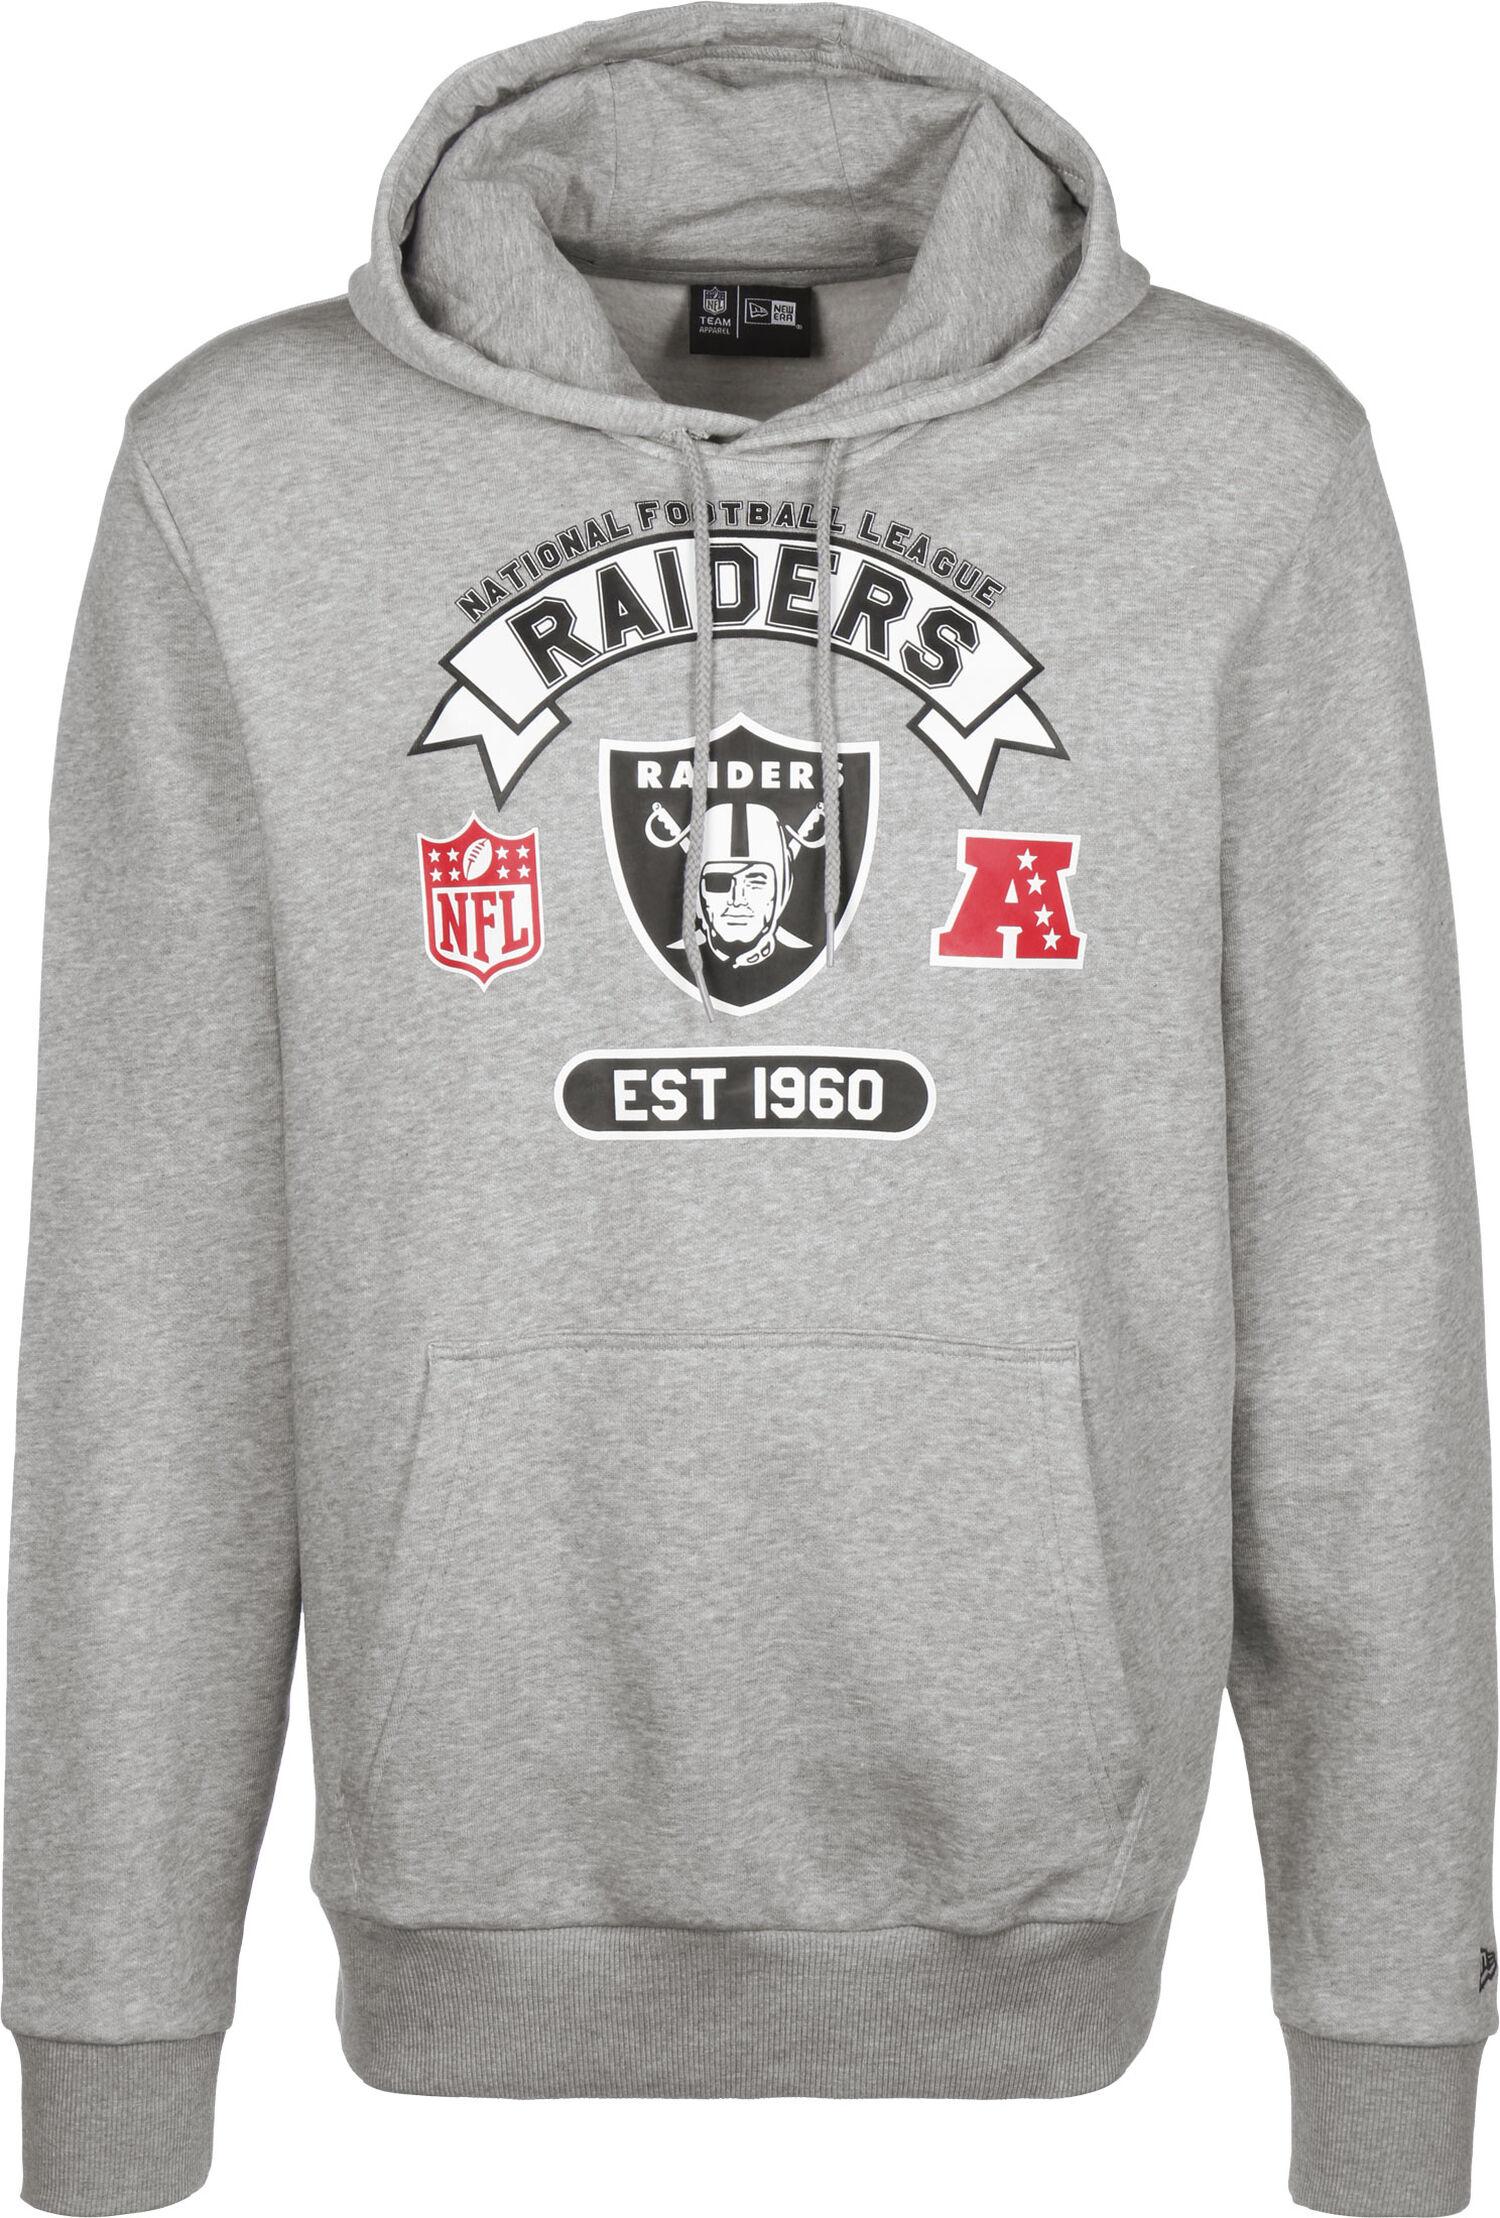 NFL Graphic Oakland Raiders